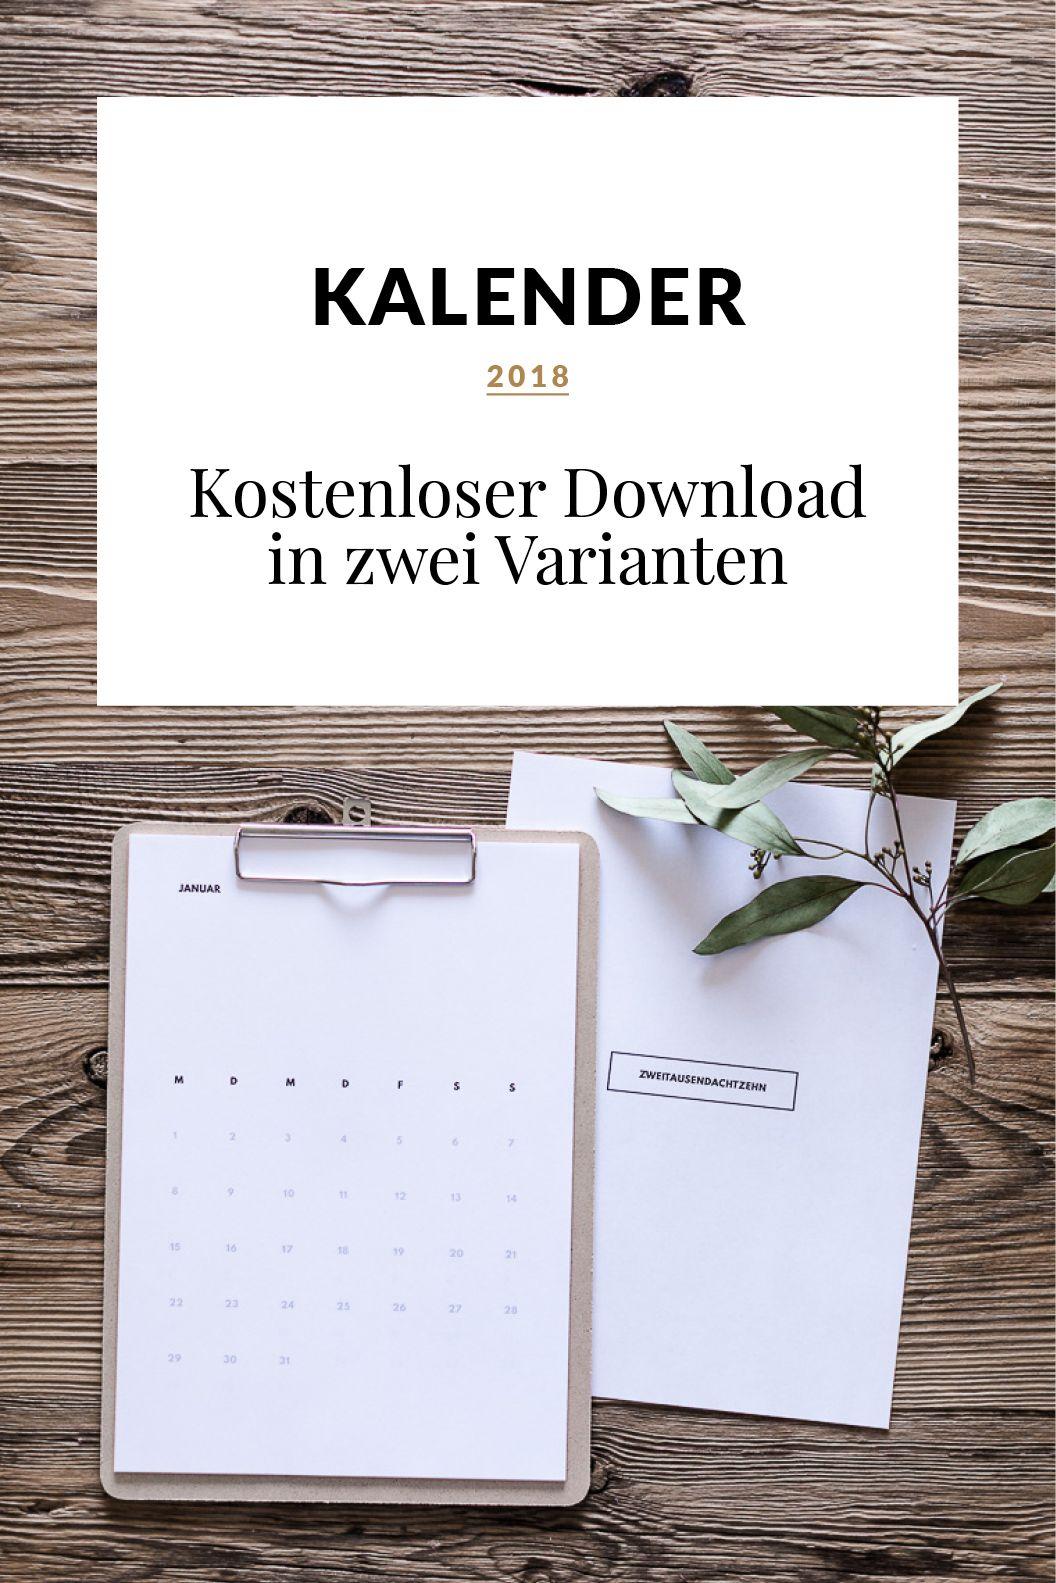 kostenloser kalender 2018 download in zwei varianten. Black Bedroom Furniture Sets. Home Design Ideas